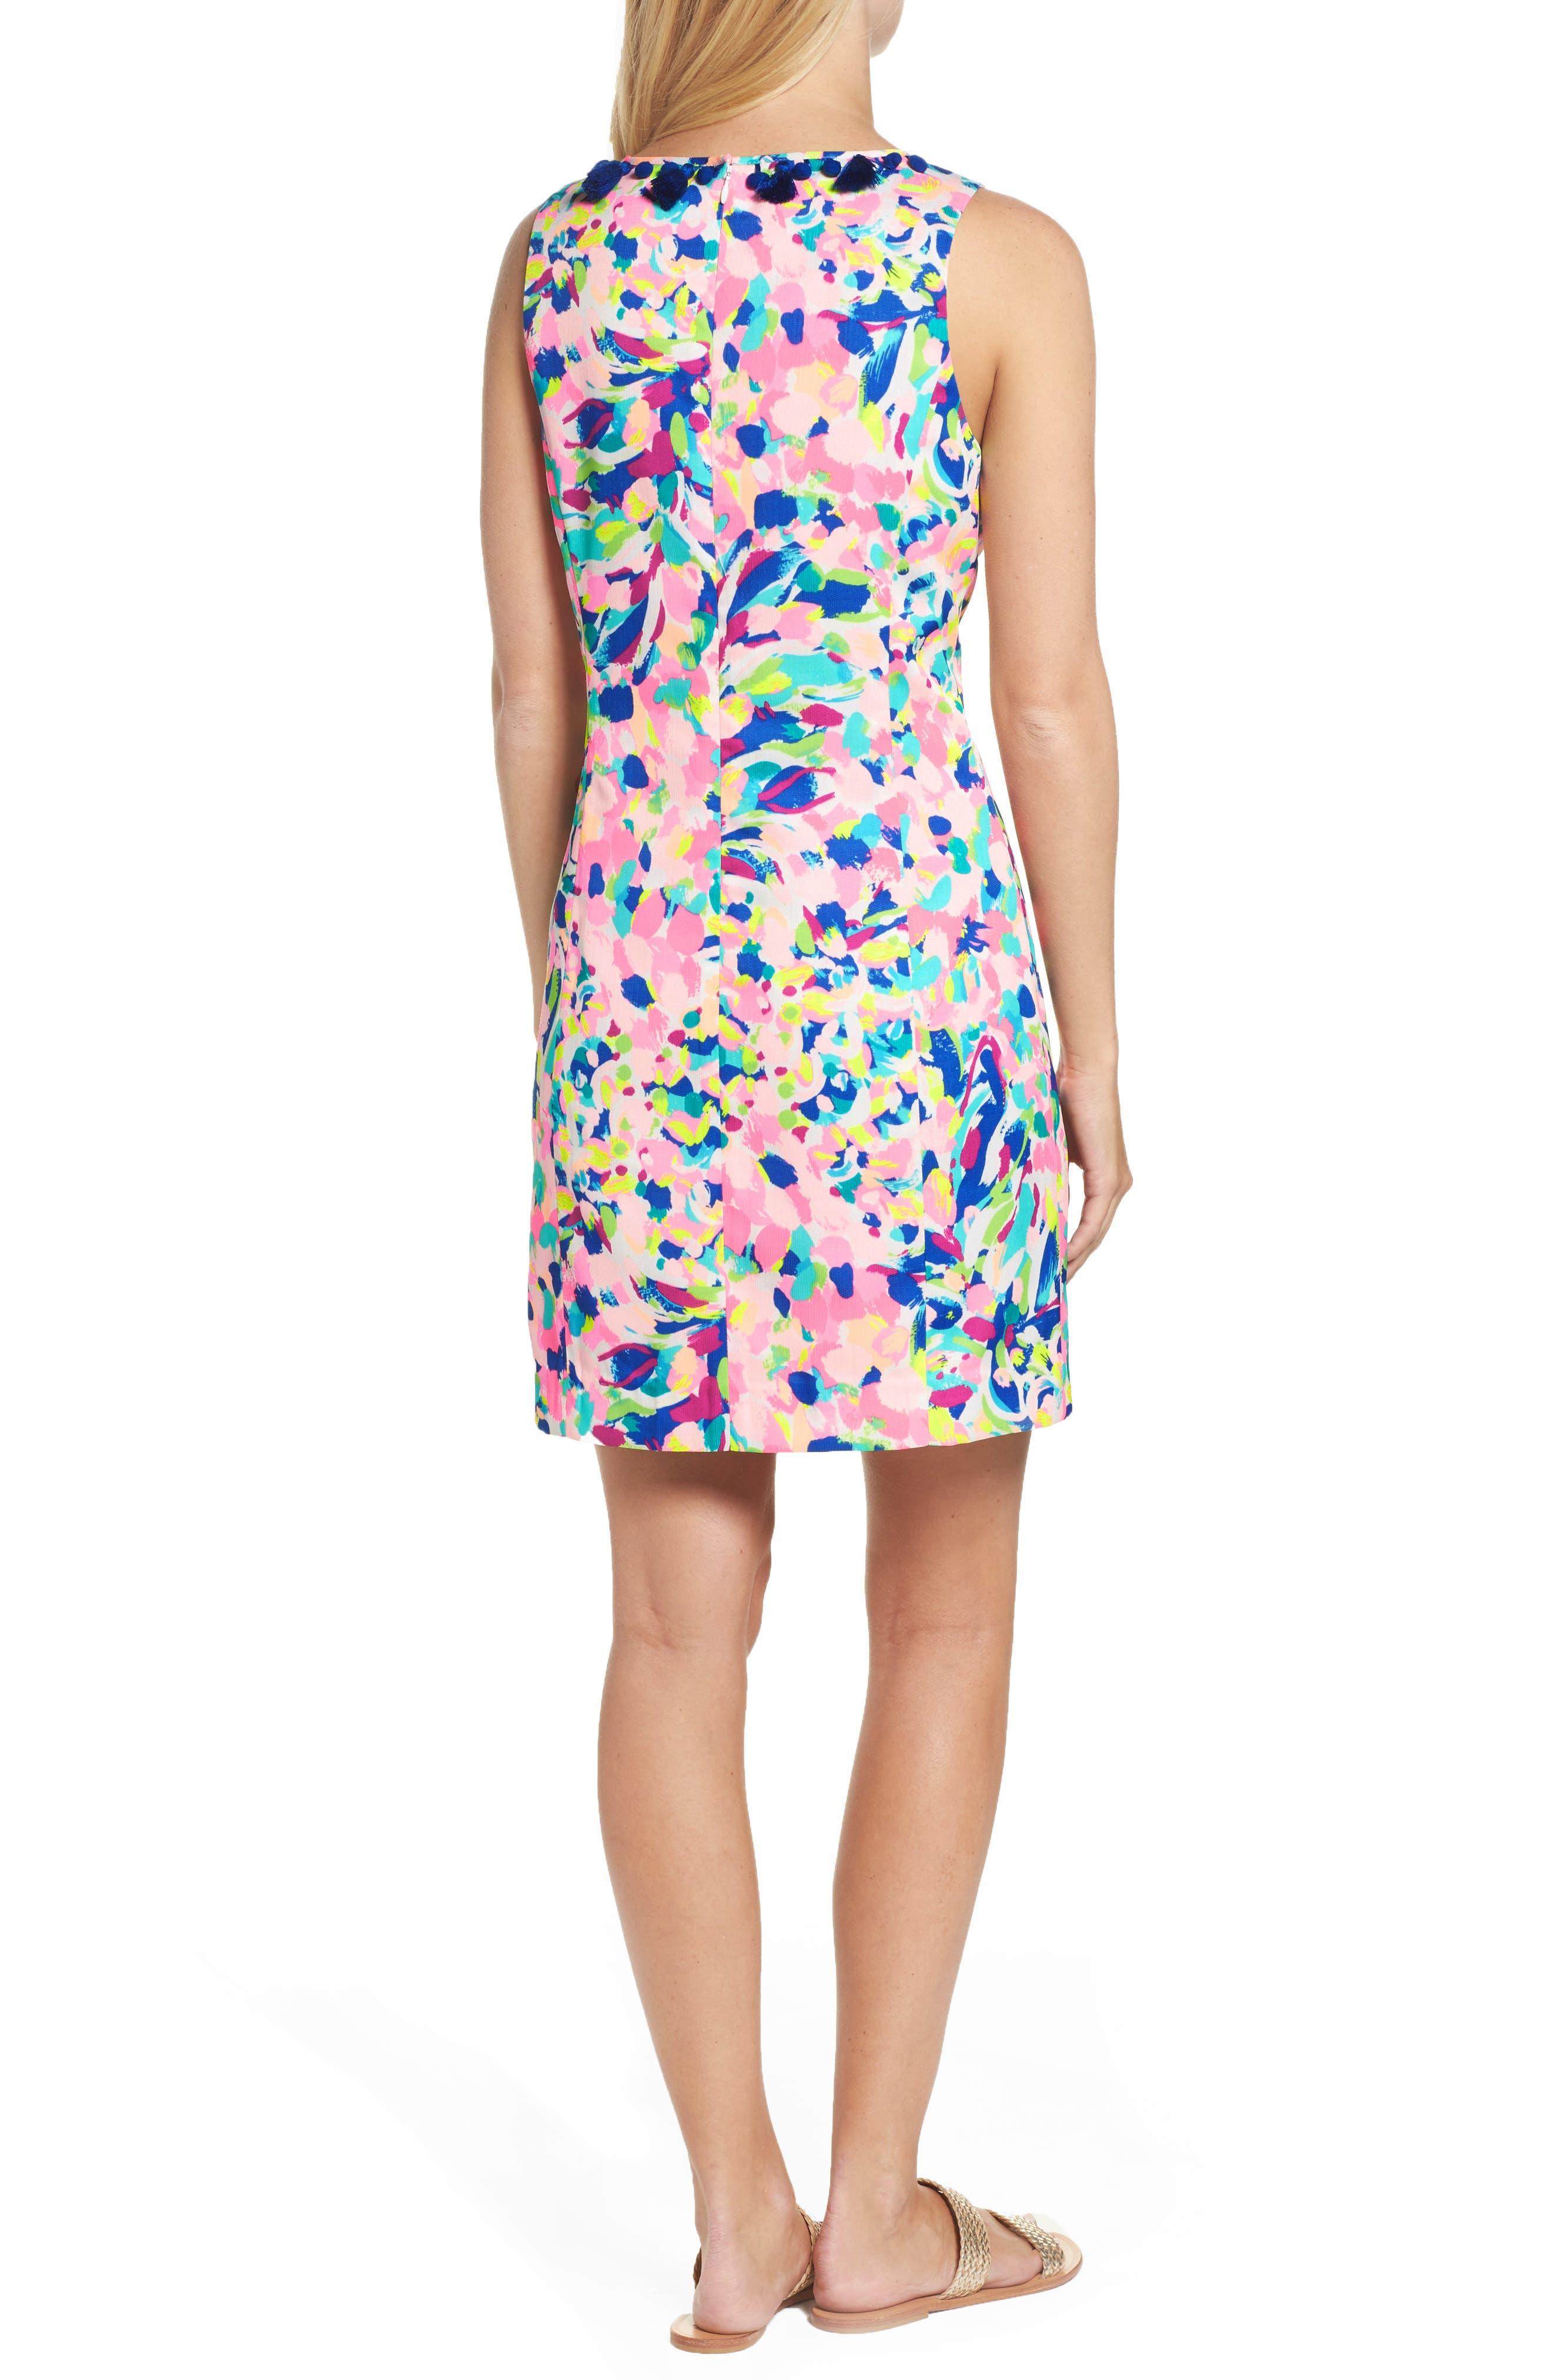 Cabrey Sheath Dress,                             Alternate thumbnail 2, color,                             Multi Pina Colada Club